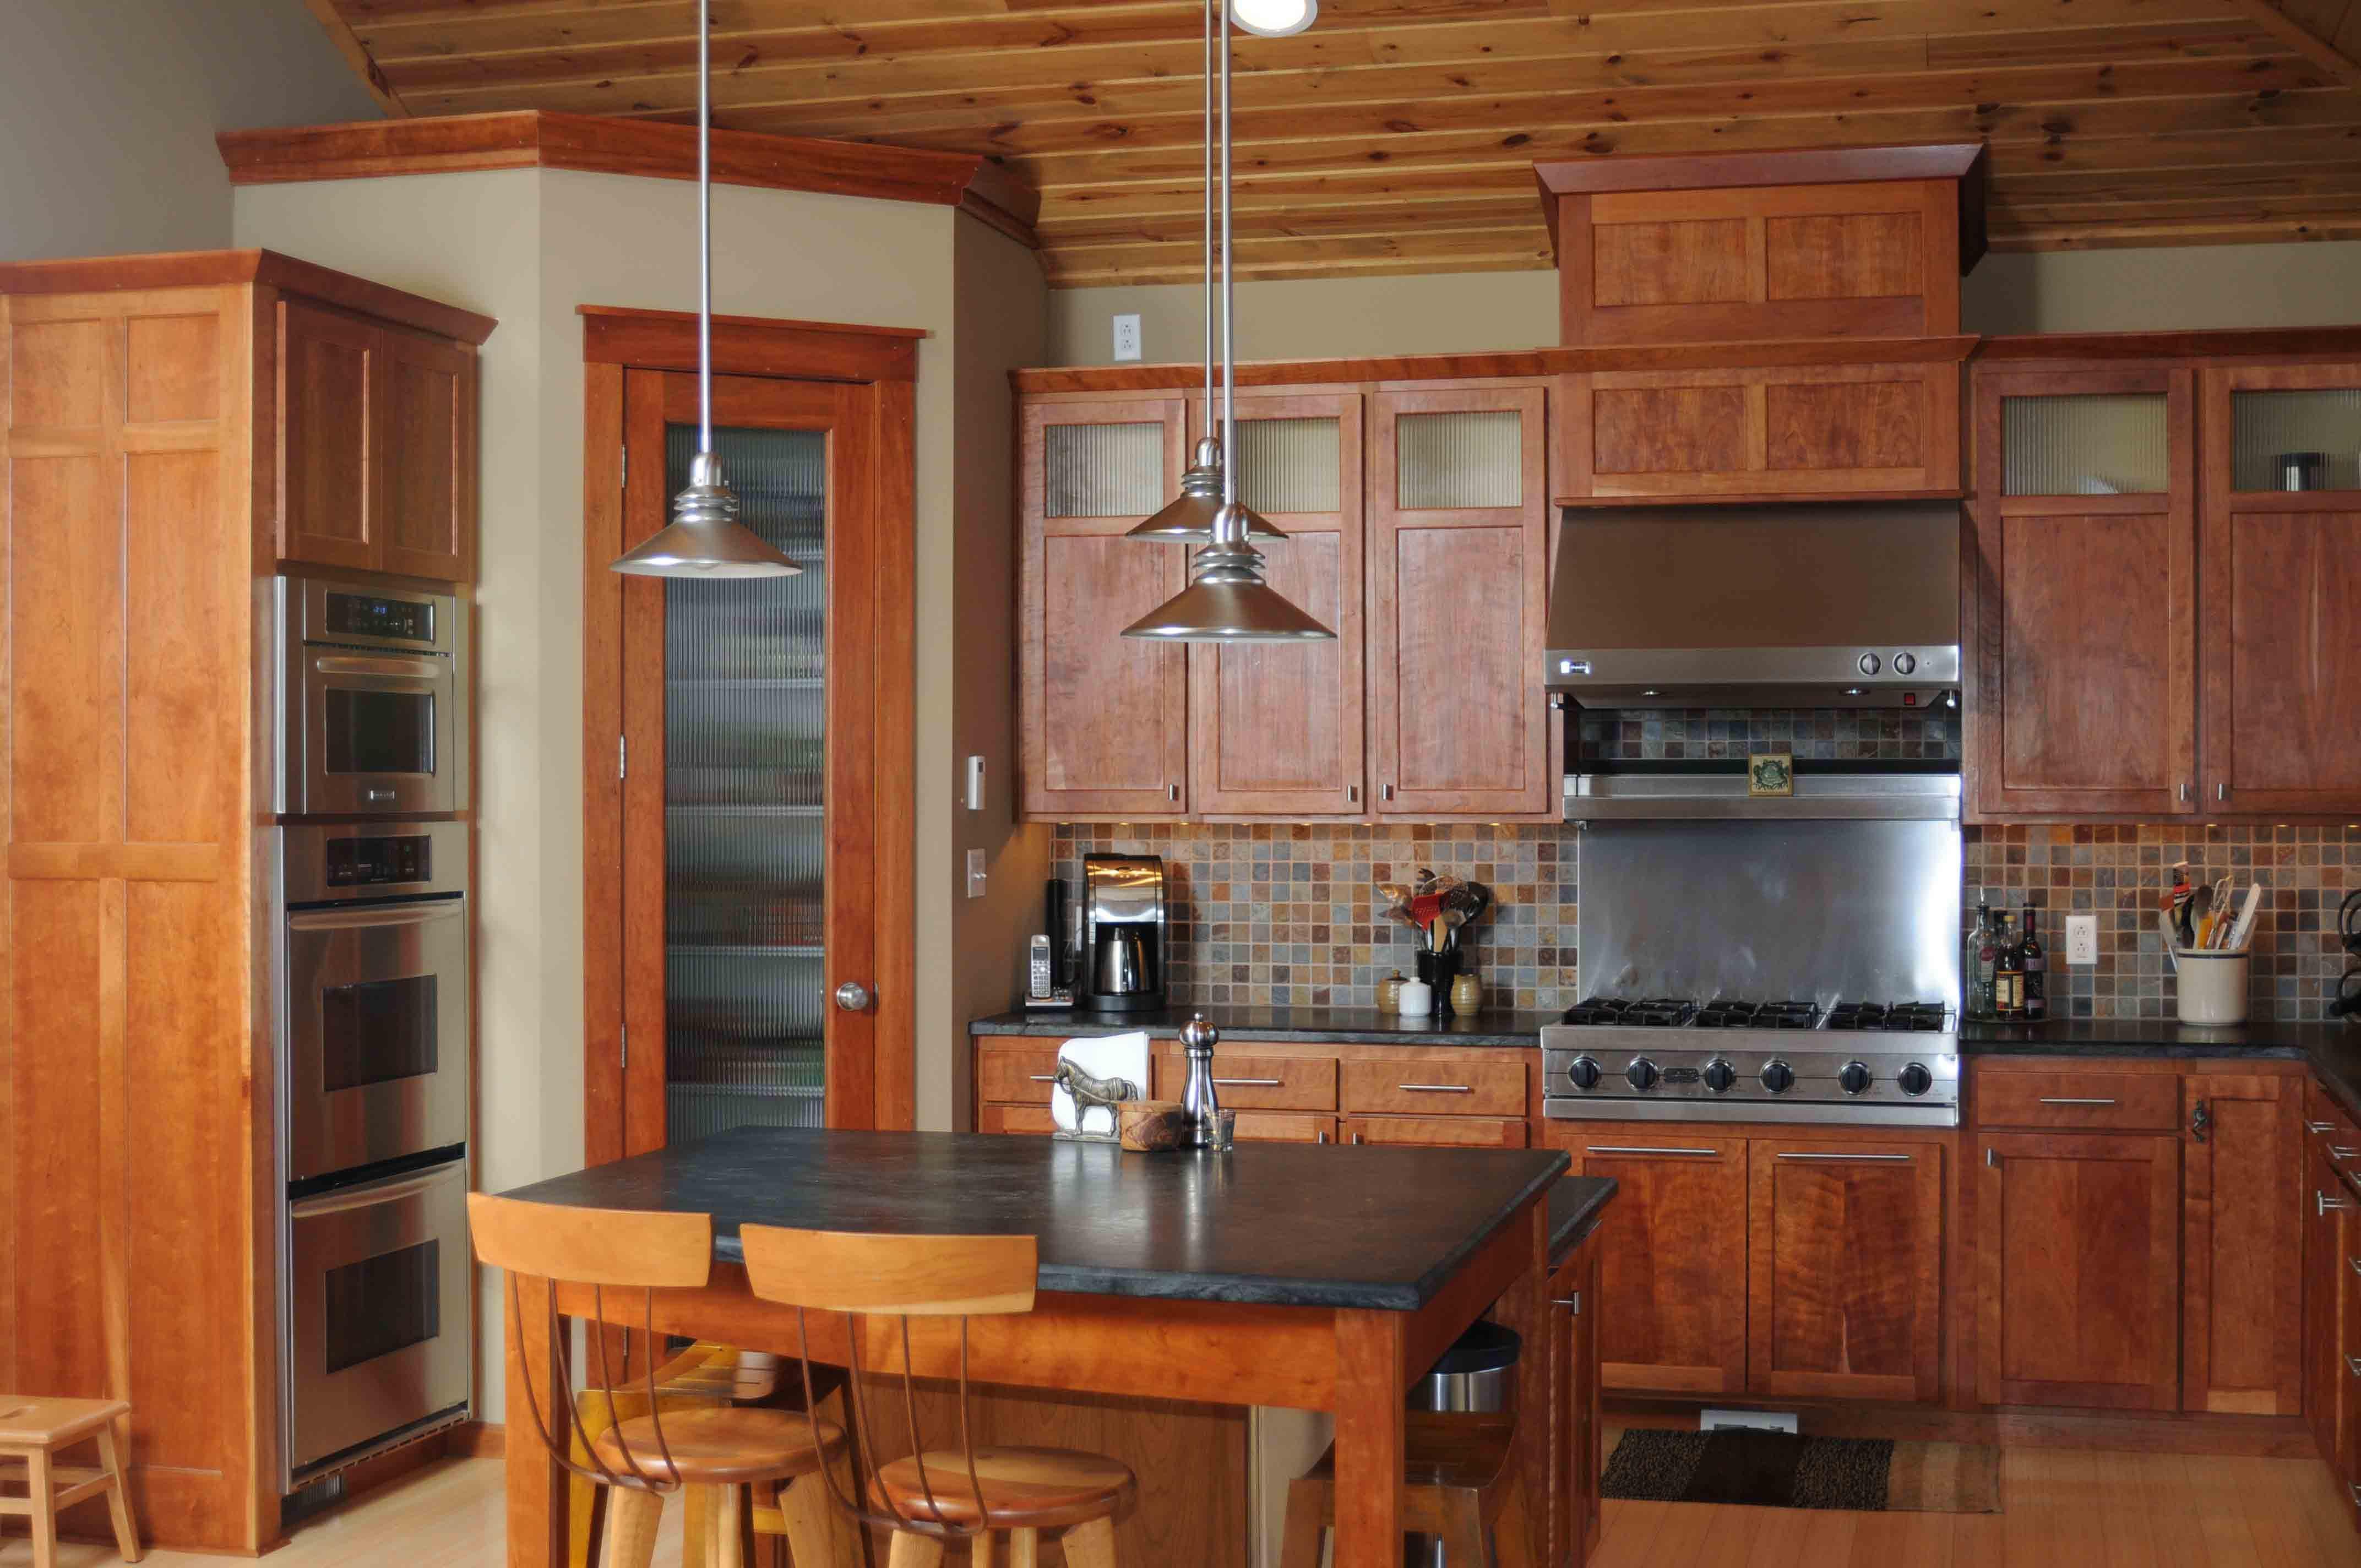 Solid Wood Handmade Furniture Diy Kitchen Decor Used Kitchen Cabinets Handmade Furniture